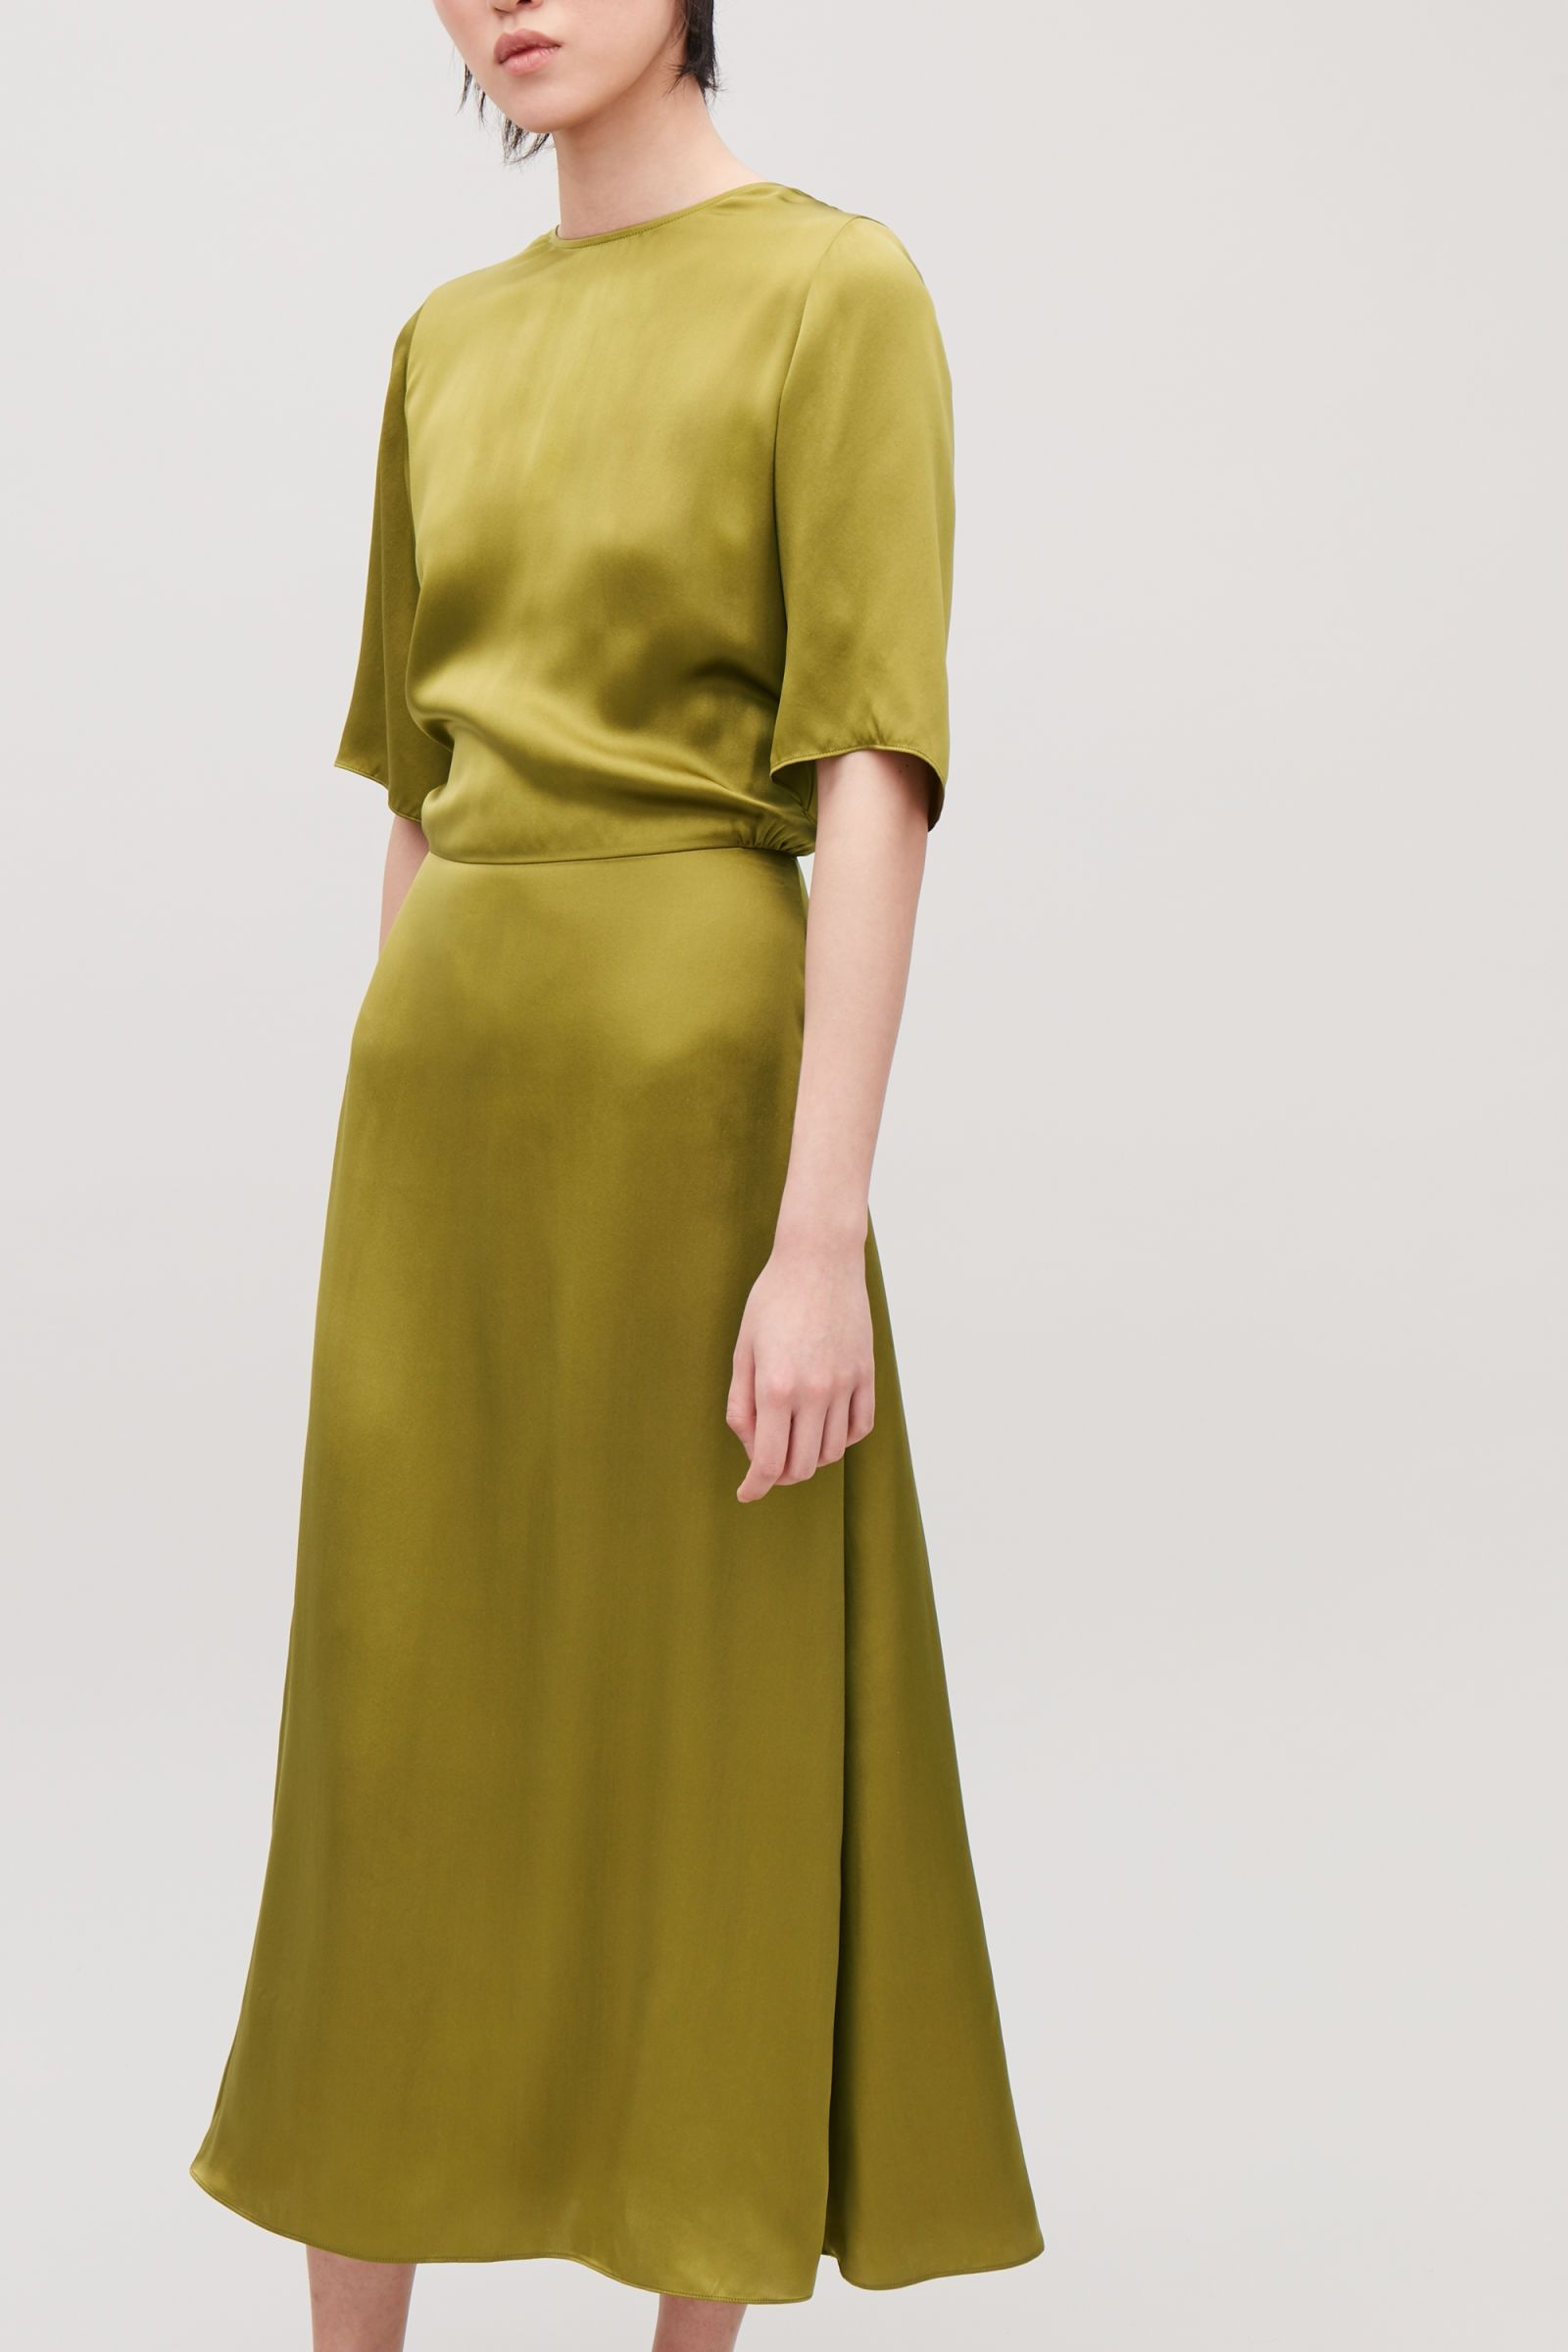 prix de la rue dernier vendu dans le monde entier LONG SILK DRESS - Woodbine green - Dresses - COS | Look en ...